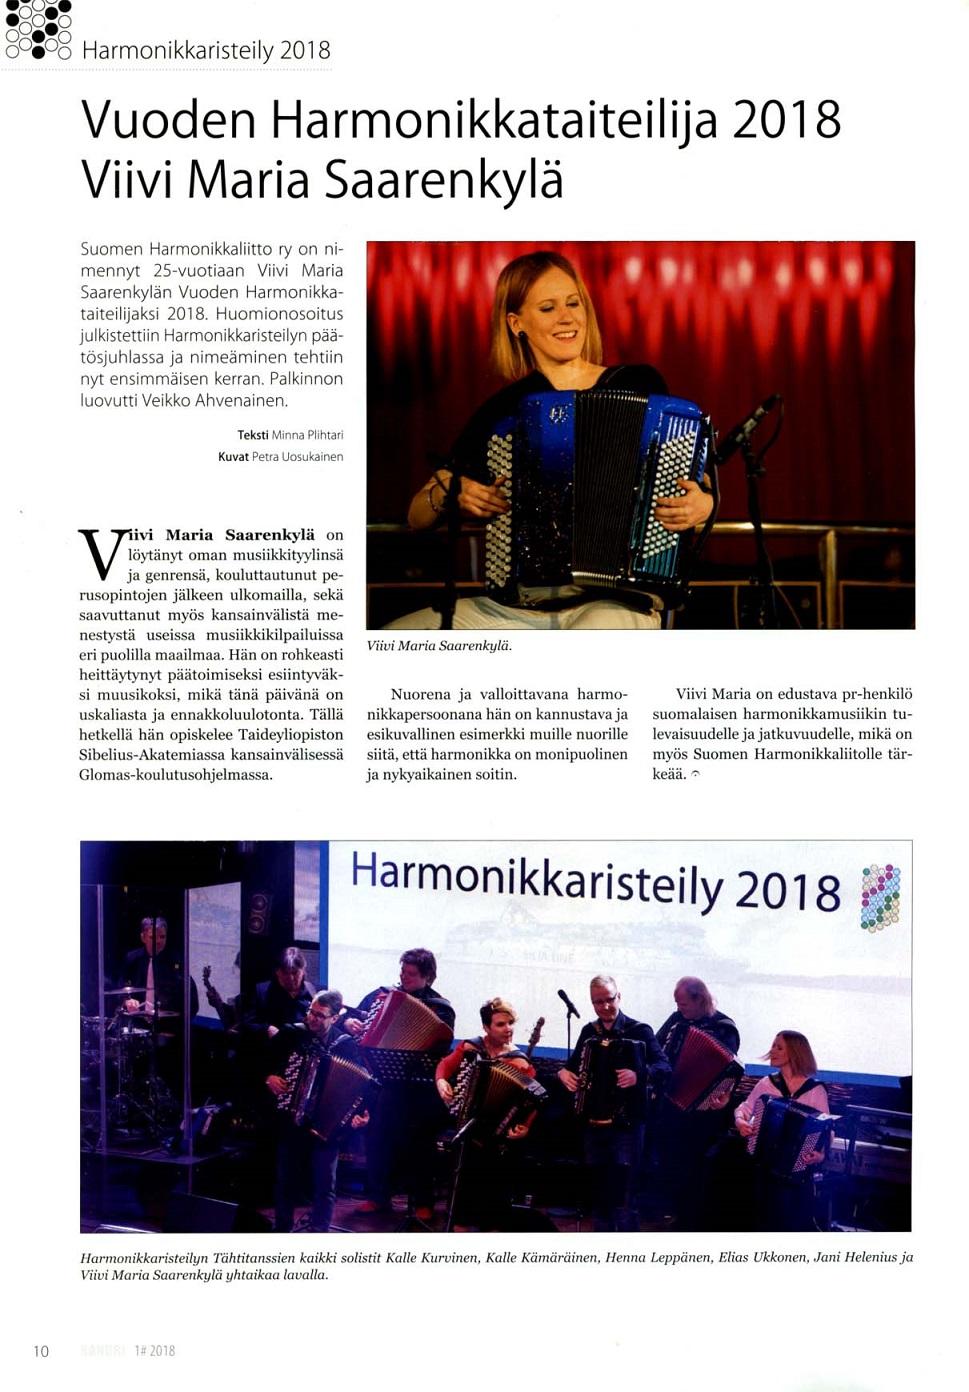 Hanuri-lehti (Finland), 2018/2